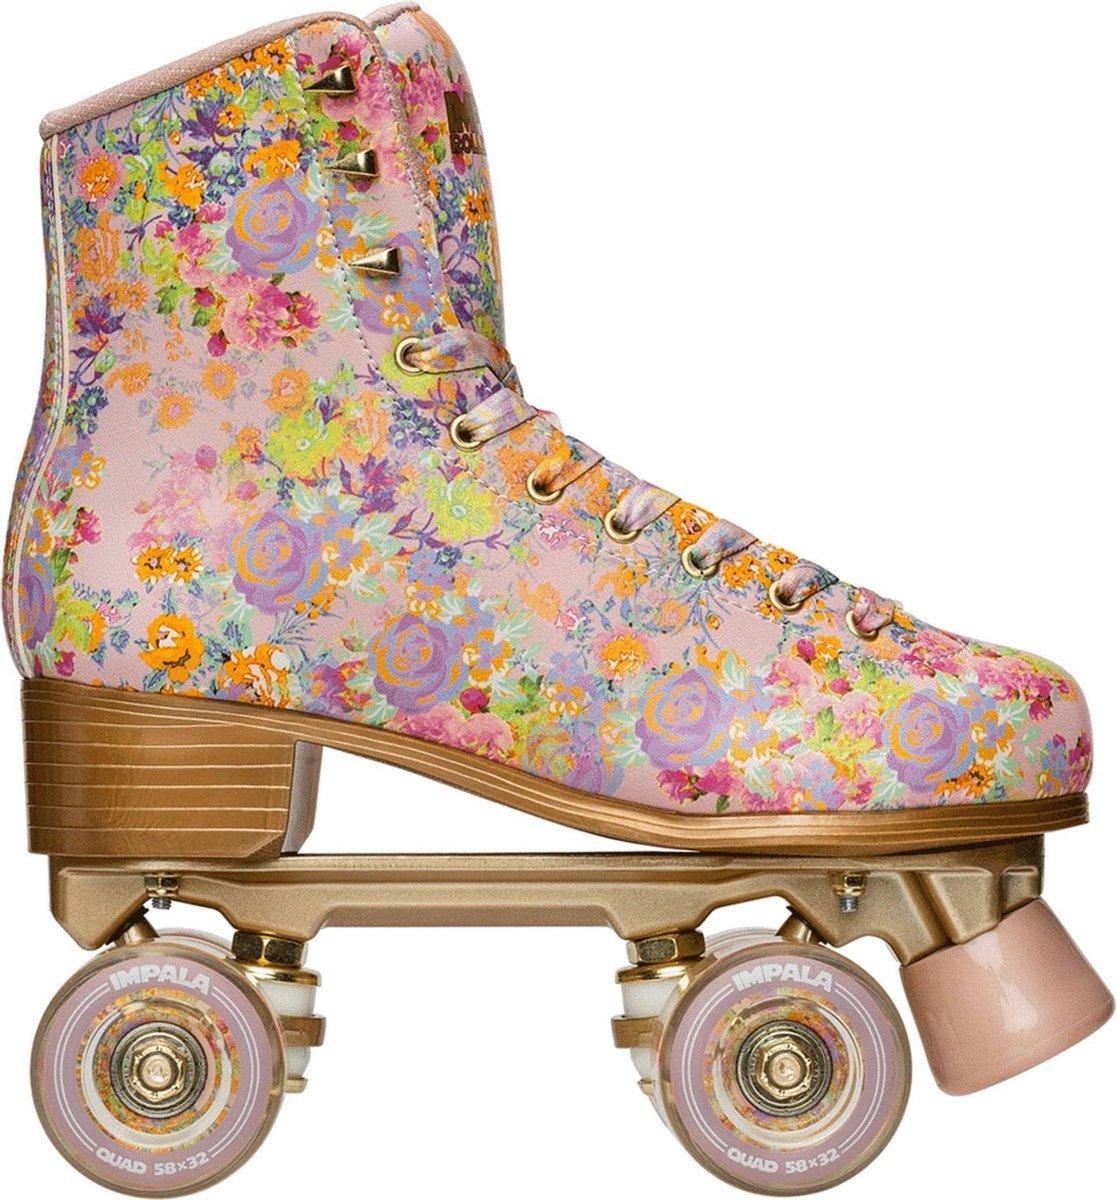 Impala Rollerskates shaka diverse > rollerskates Quad Skate - Cynthia Rowley Floral 41